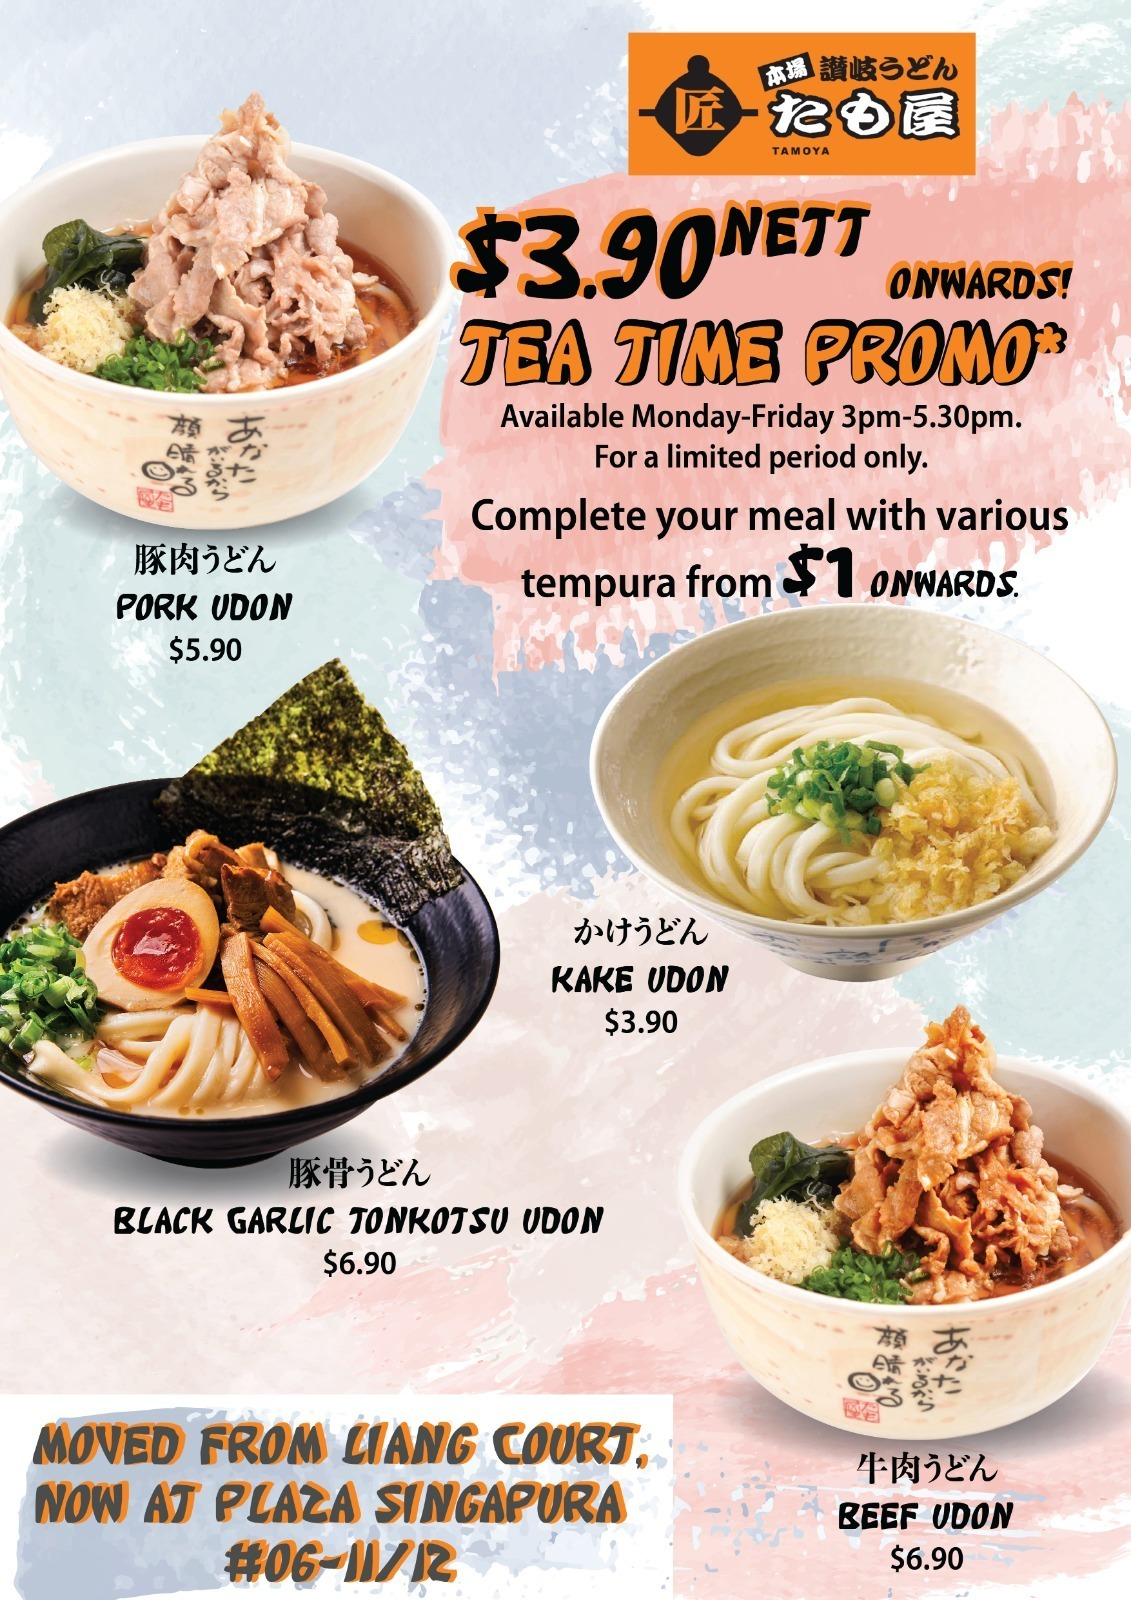 Tea Time Promo $3.90 Udon at Tamoya Udon, Plaza Singapura